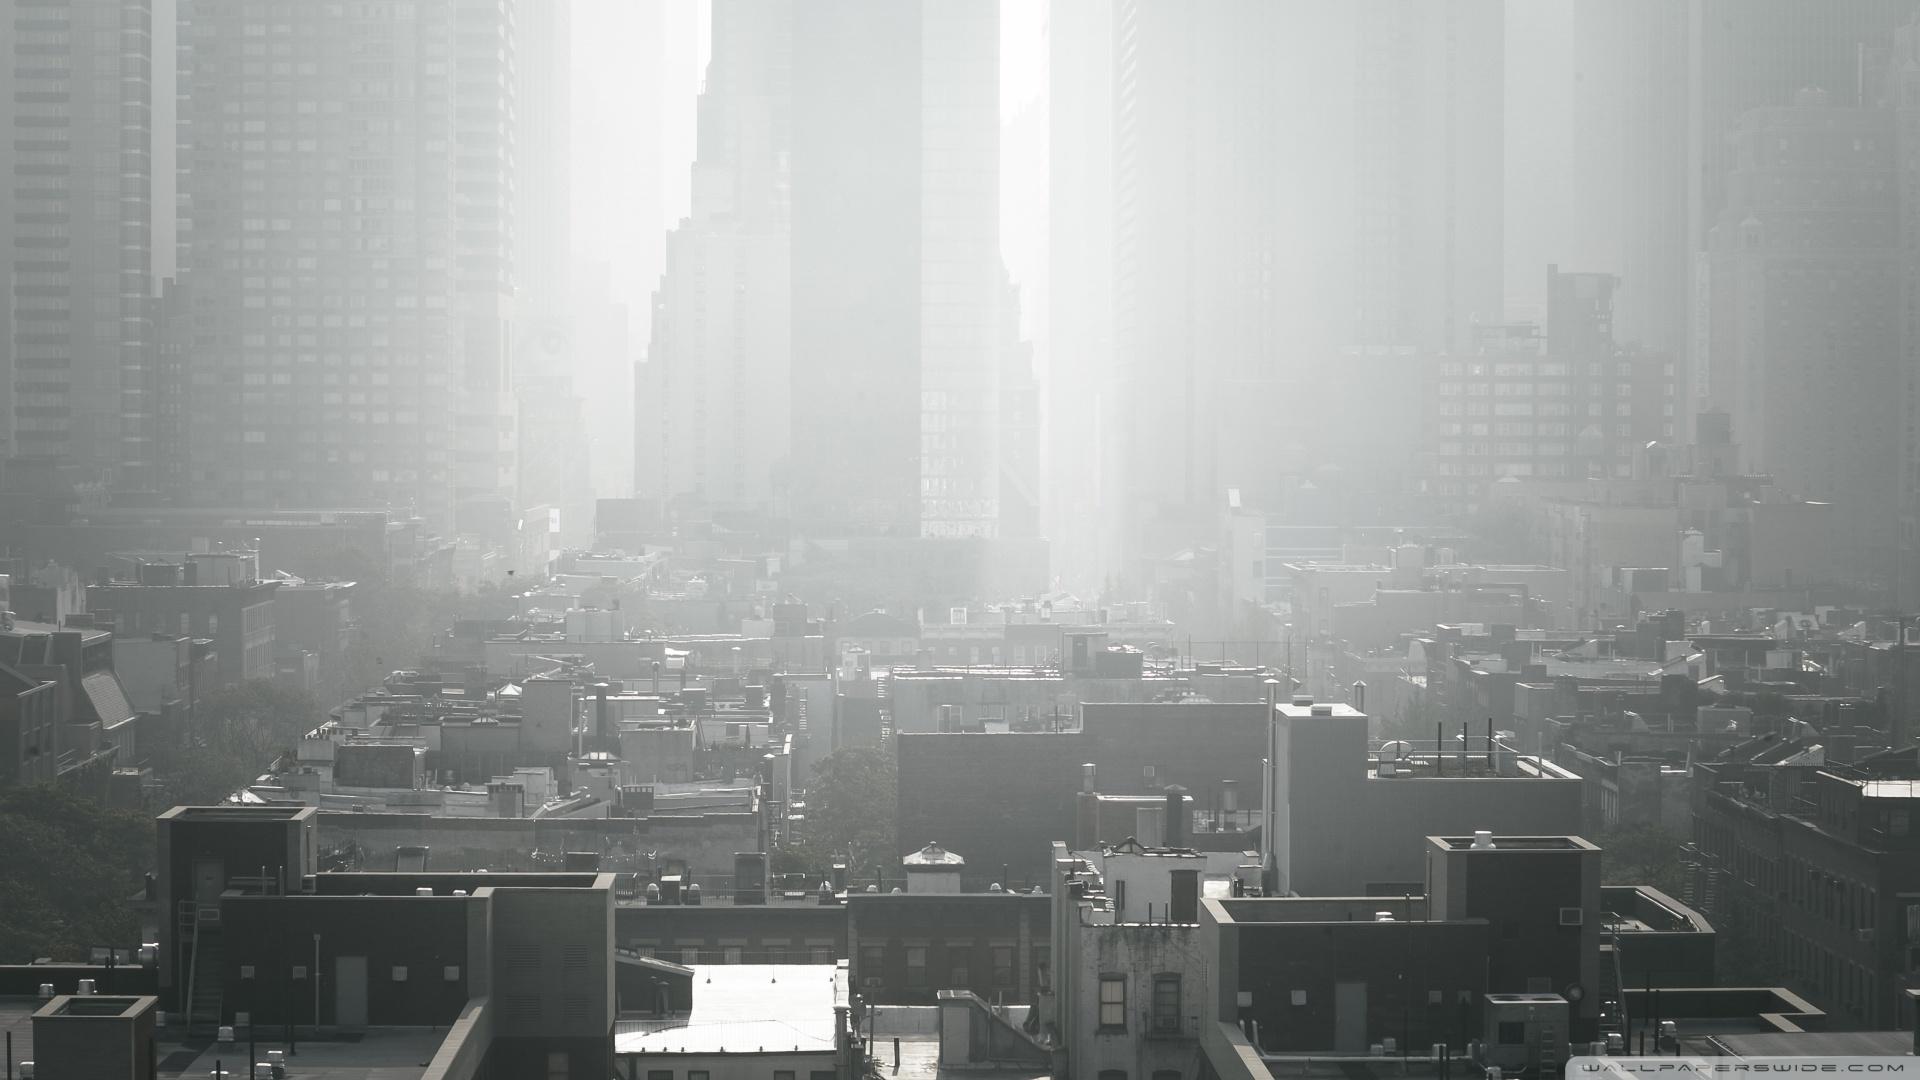 Hd Car Wallpapers 1600x1200 New York City Smog 4k Hd Desktop Wallpaper For 4k Ultra Hd